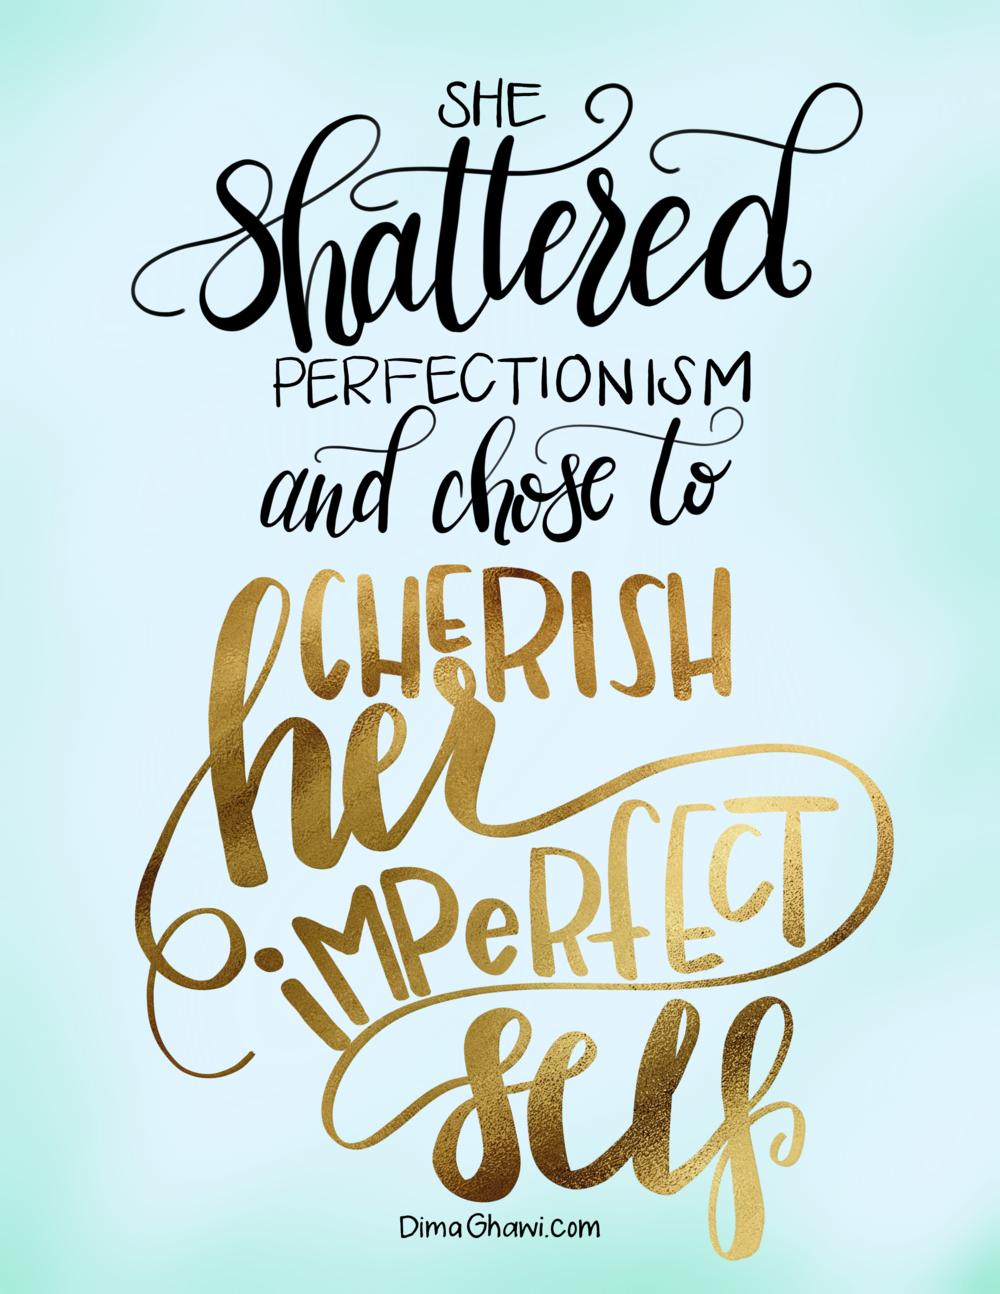 Cherish her imperfect self - SMALL.jpeg